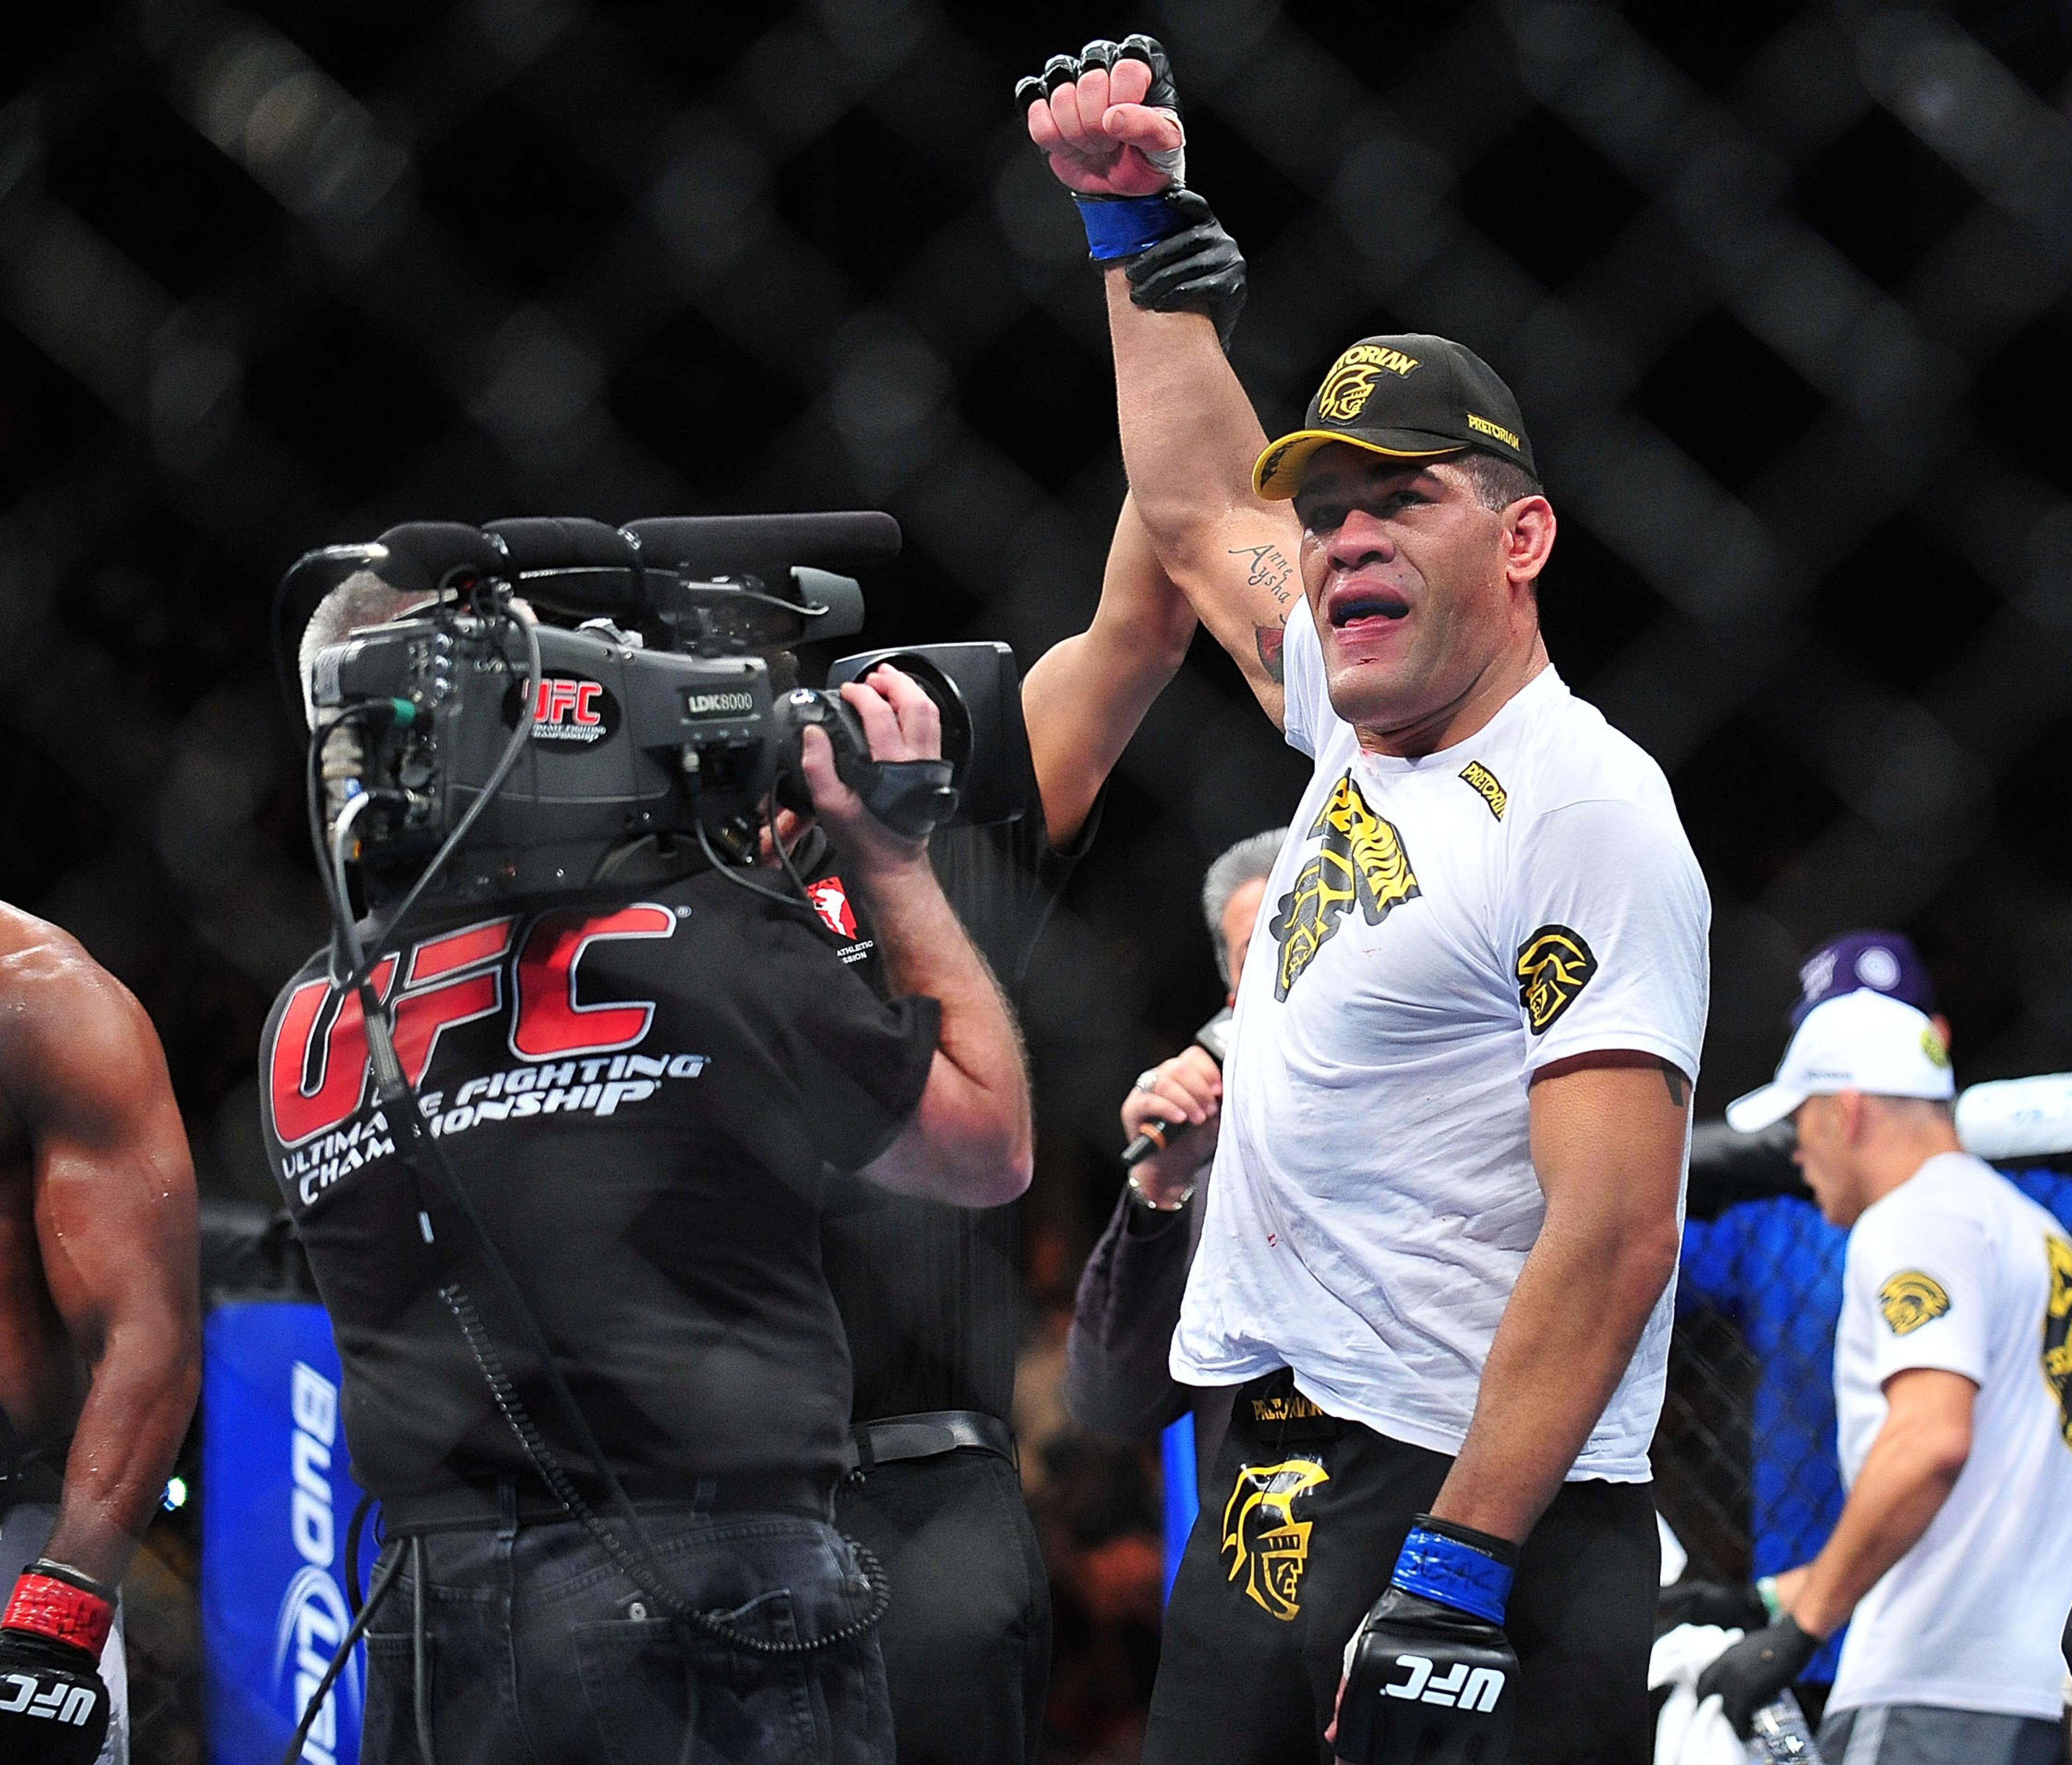 The lineal champion, Antonio Silva